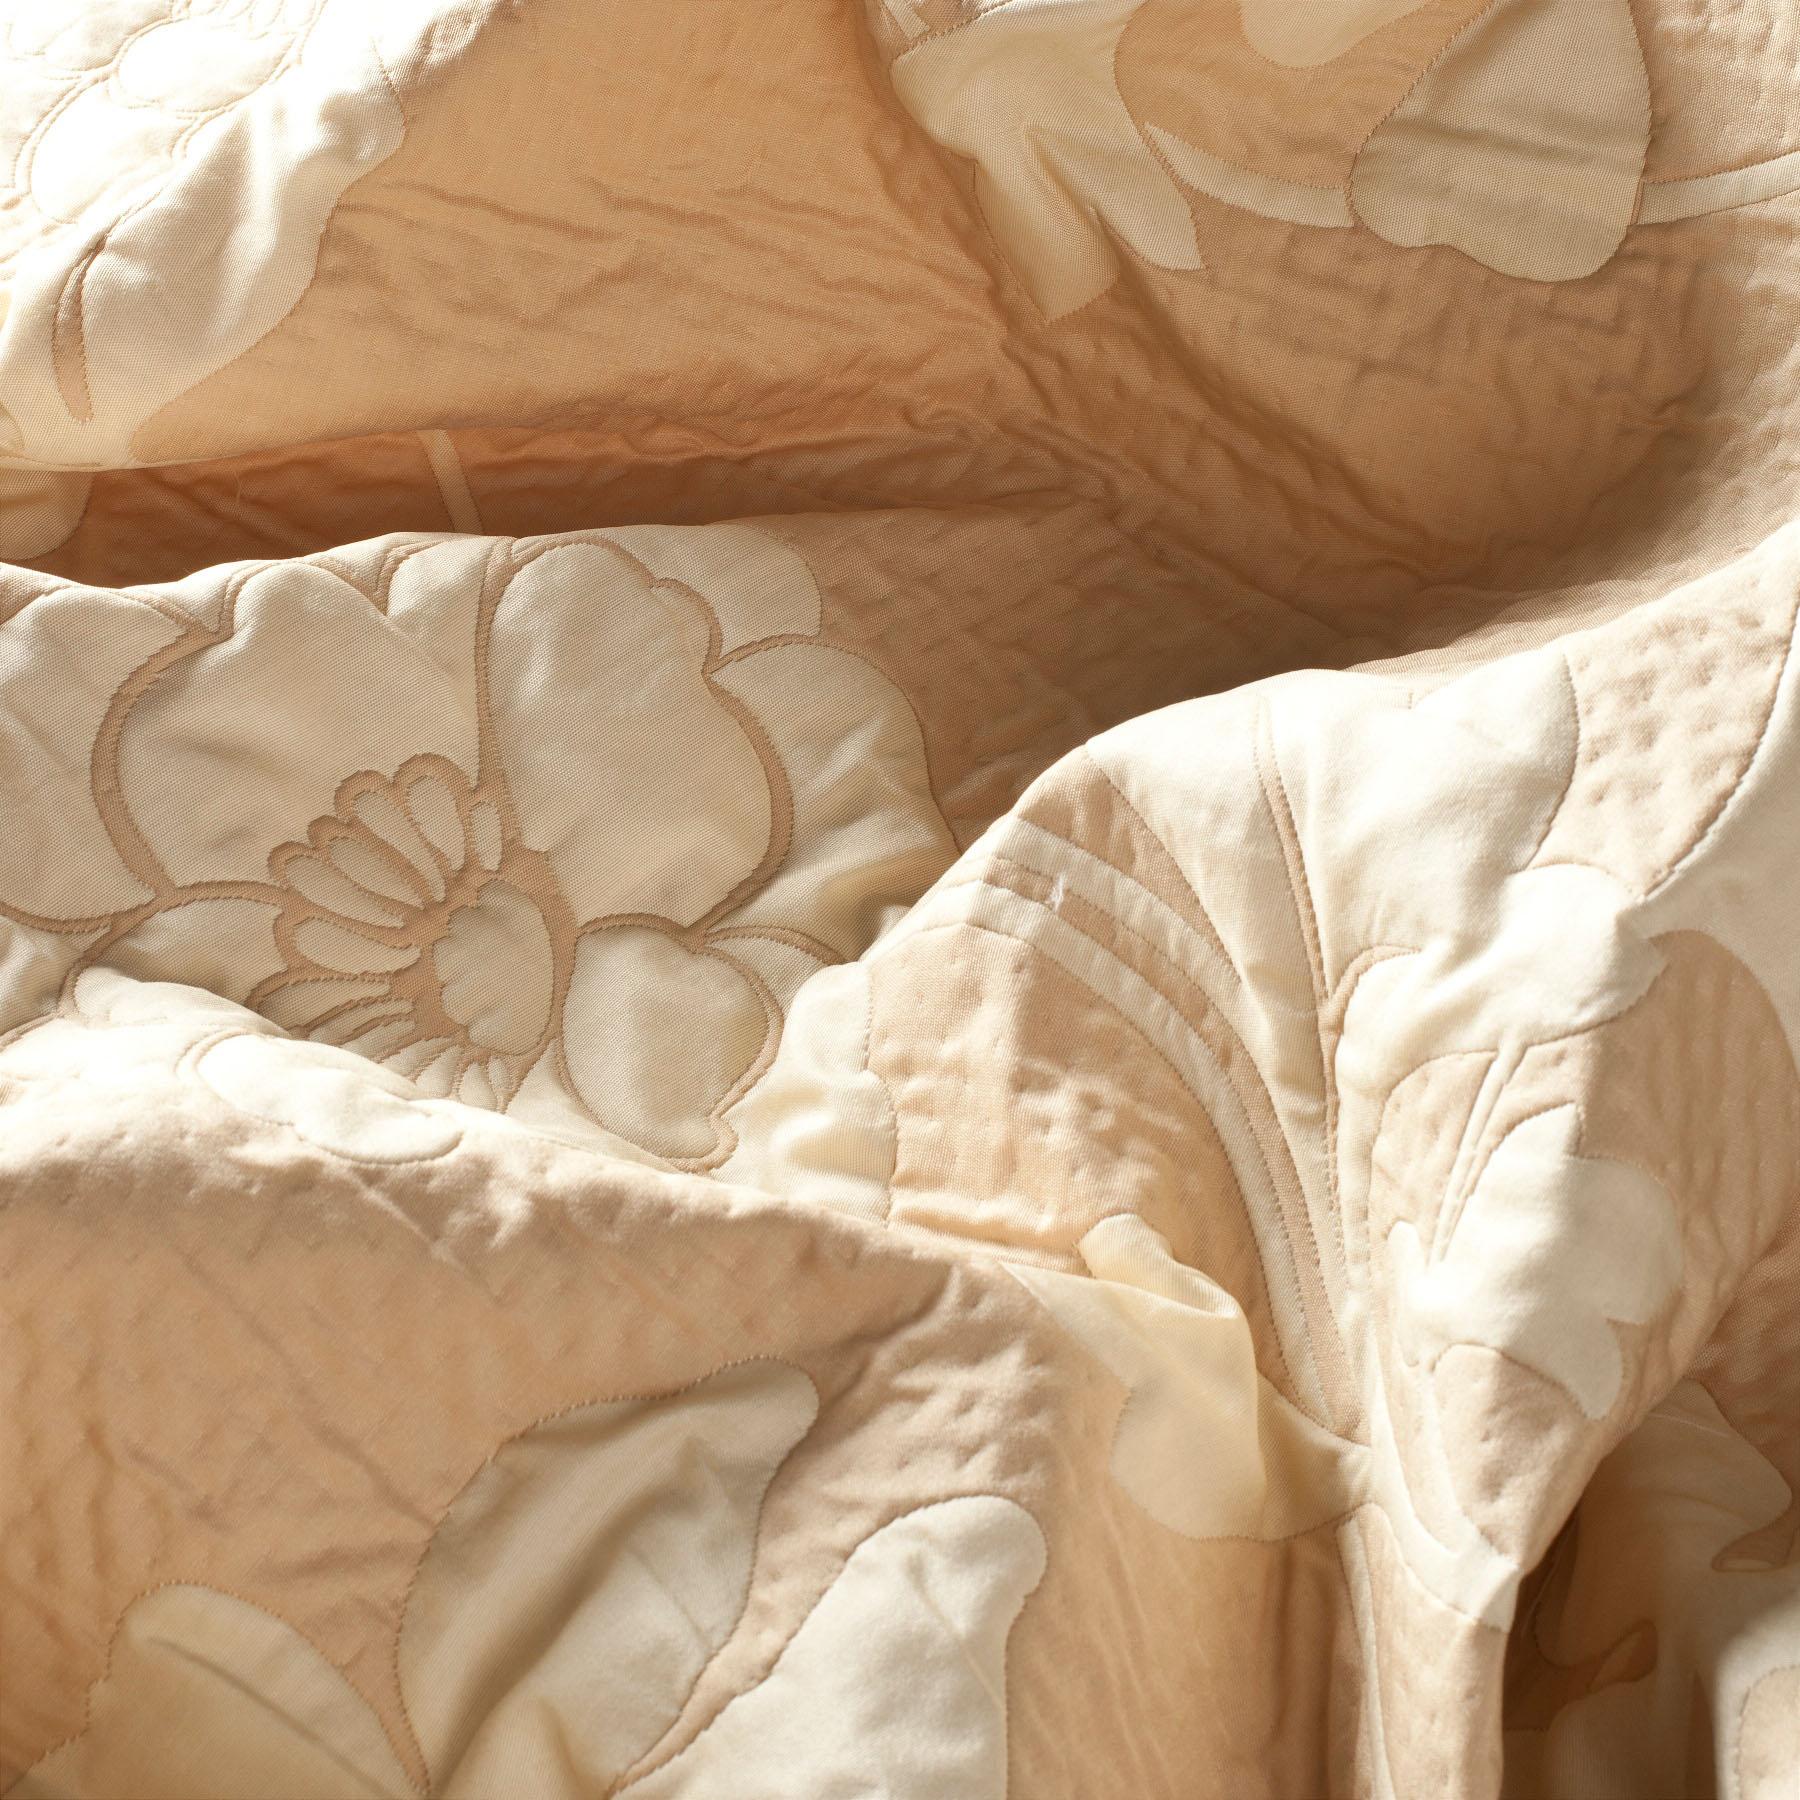 decoration fabric medusa 9 7248 072 jab anstoetz. Black Bedroom Furniture Sets. Home Design Ideas